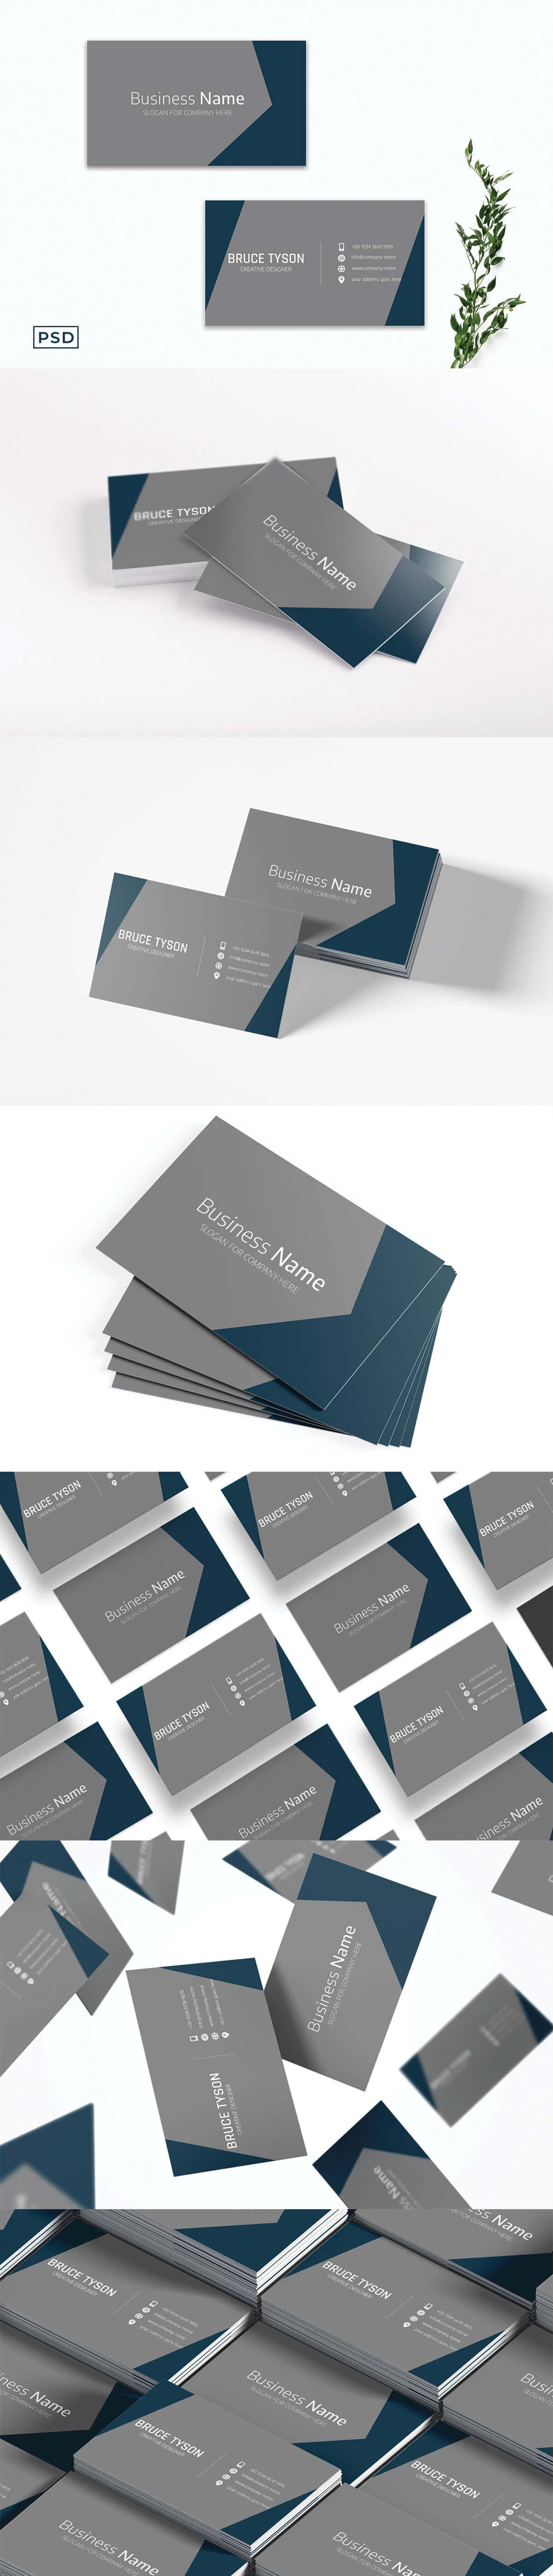 Free Modern Innovative Business Card Template